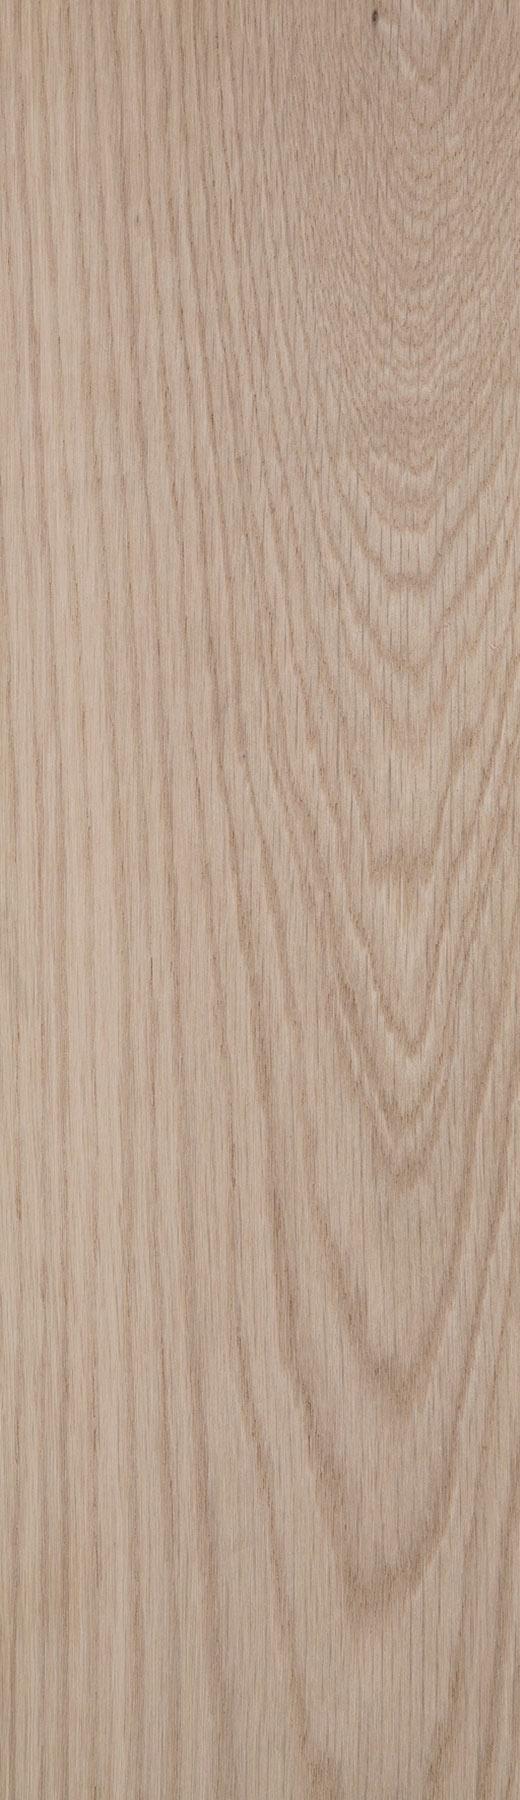 maderas-terramont-loft-life-white-oak-acabado en obra